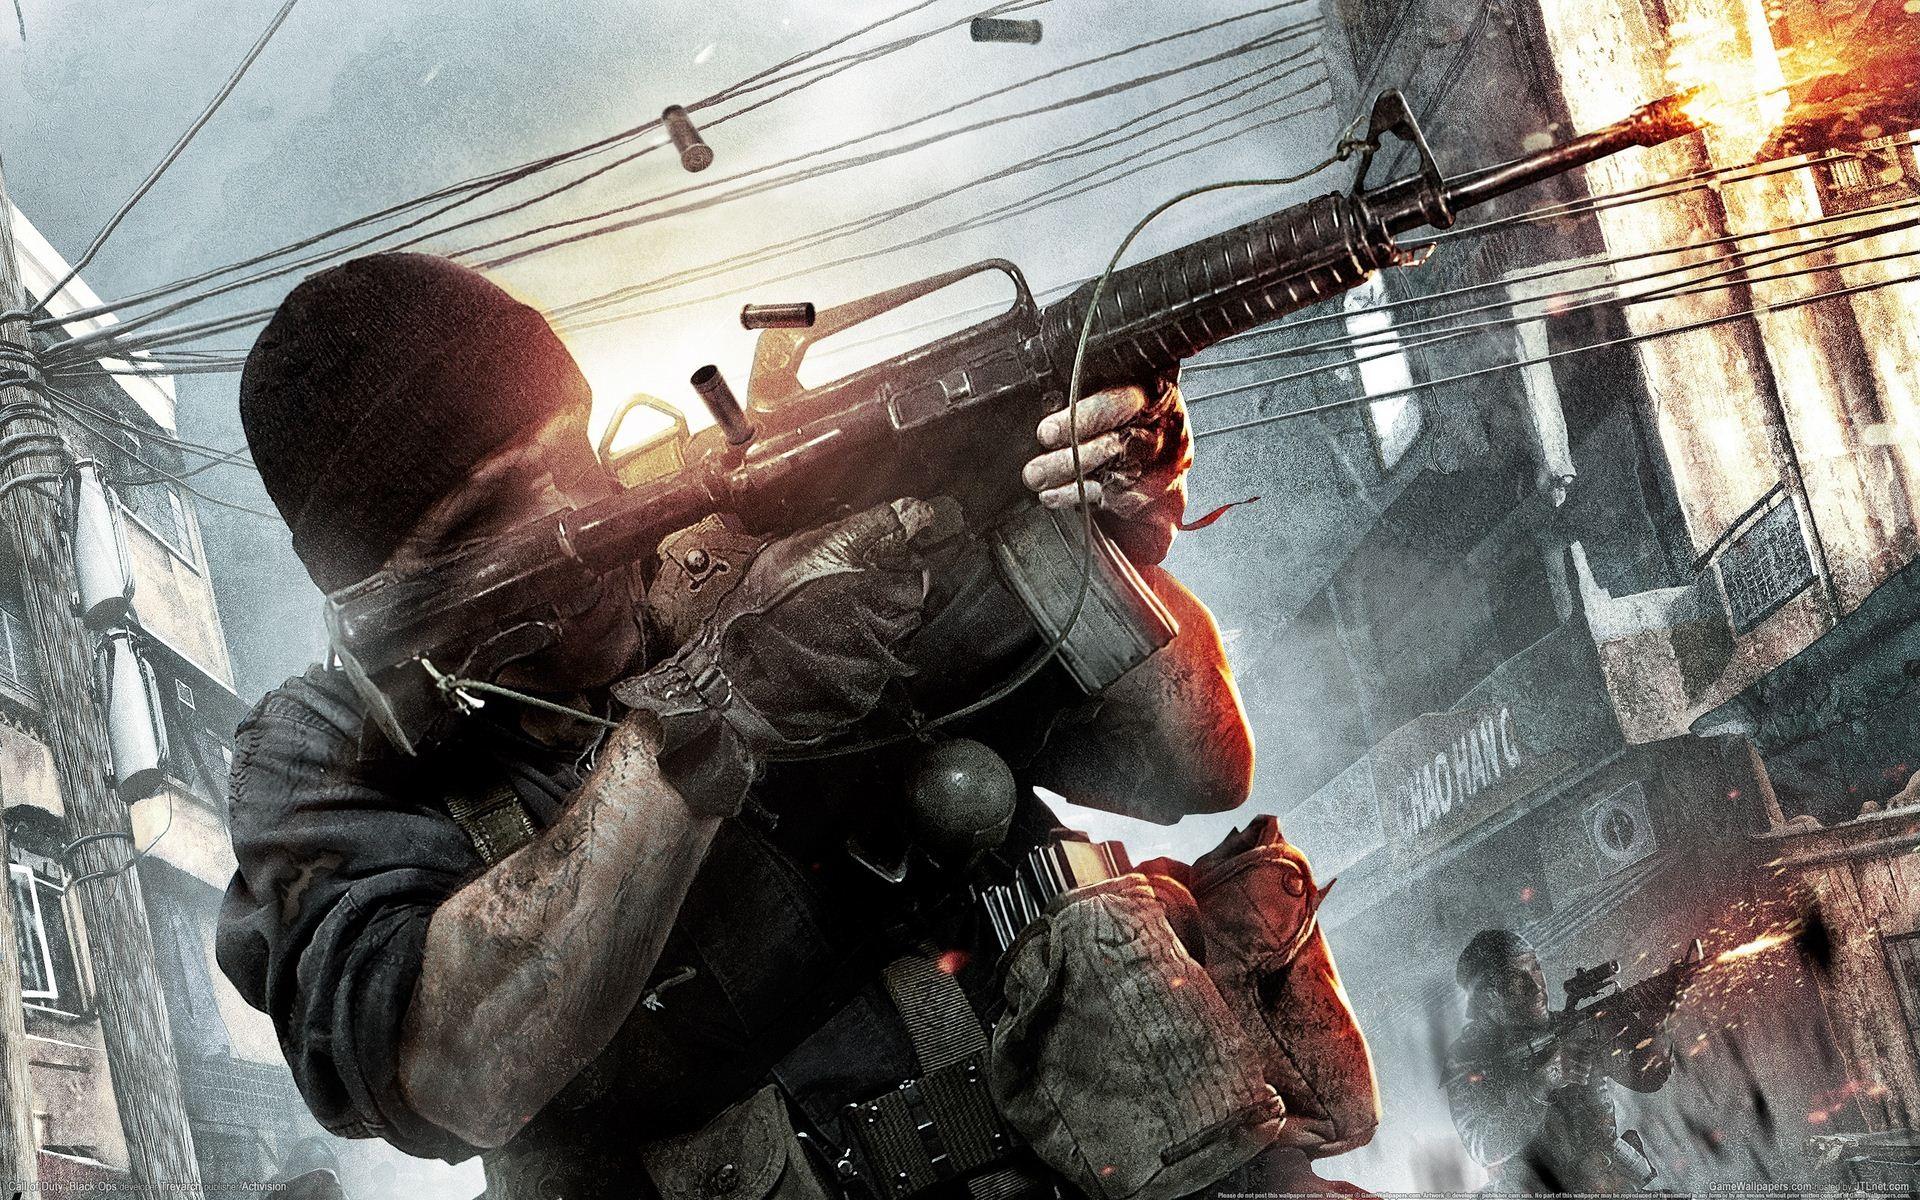 Original Similar Wallpapers More Preview Wallpaper Call Of Duty Black Ops